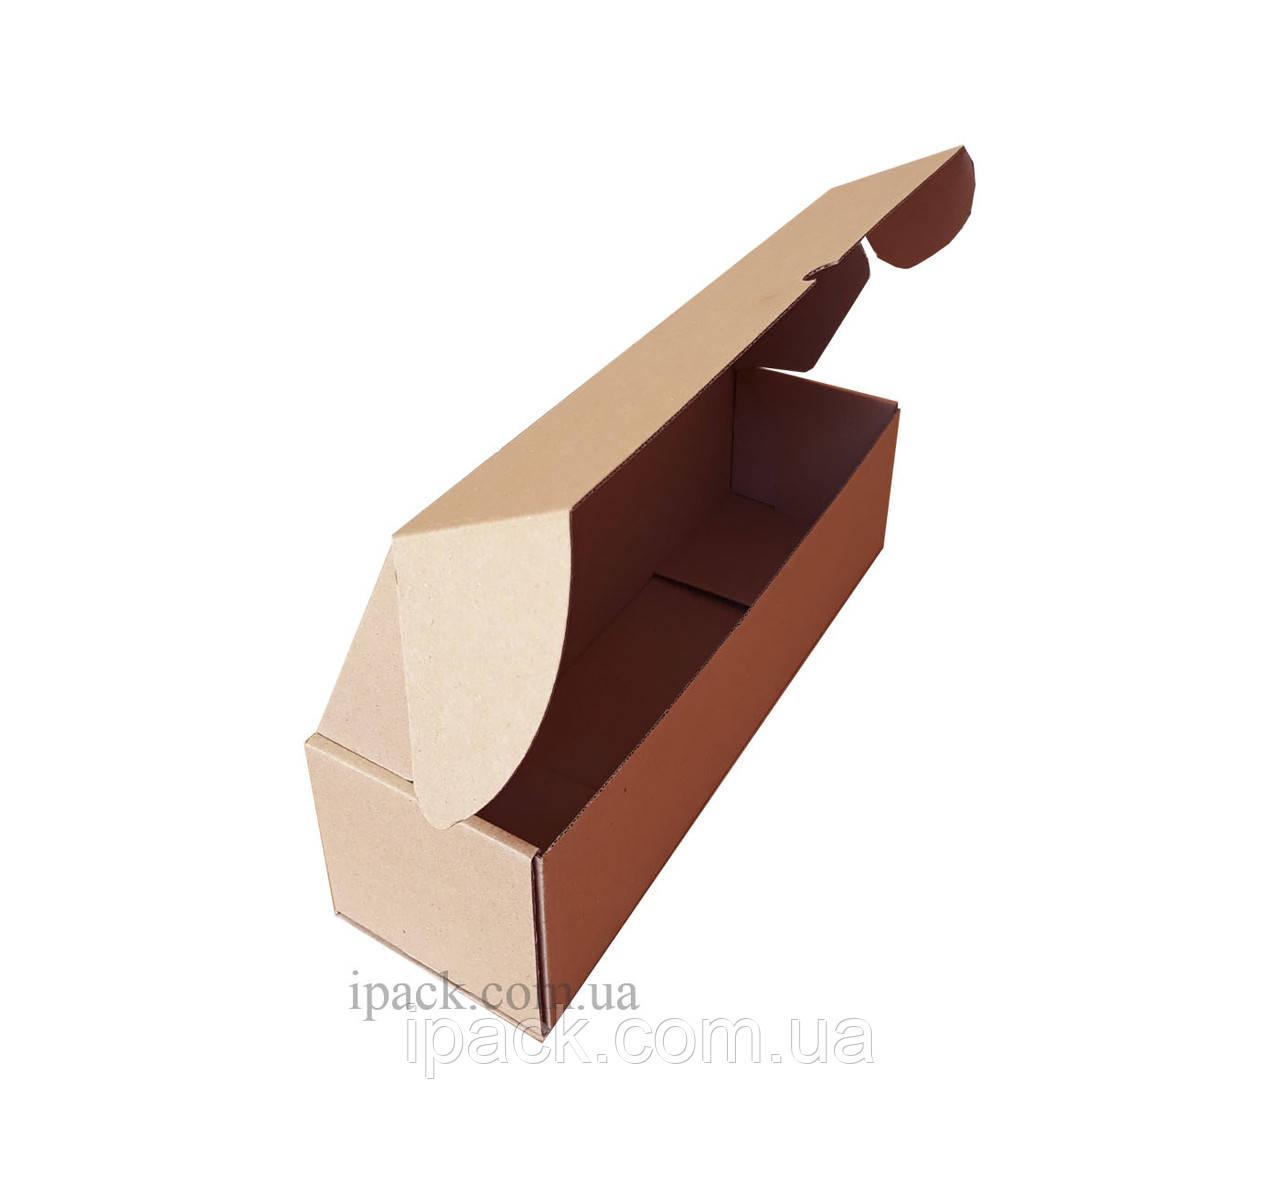 Коробка картонная самосборная, 355*105*75, мм, бурая, крафт, микрогофрокартон